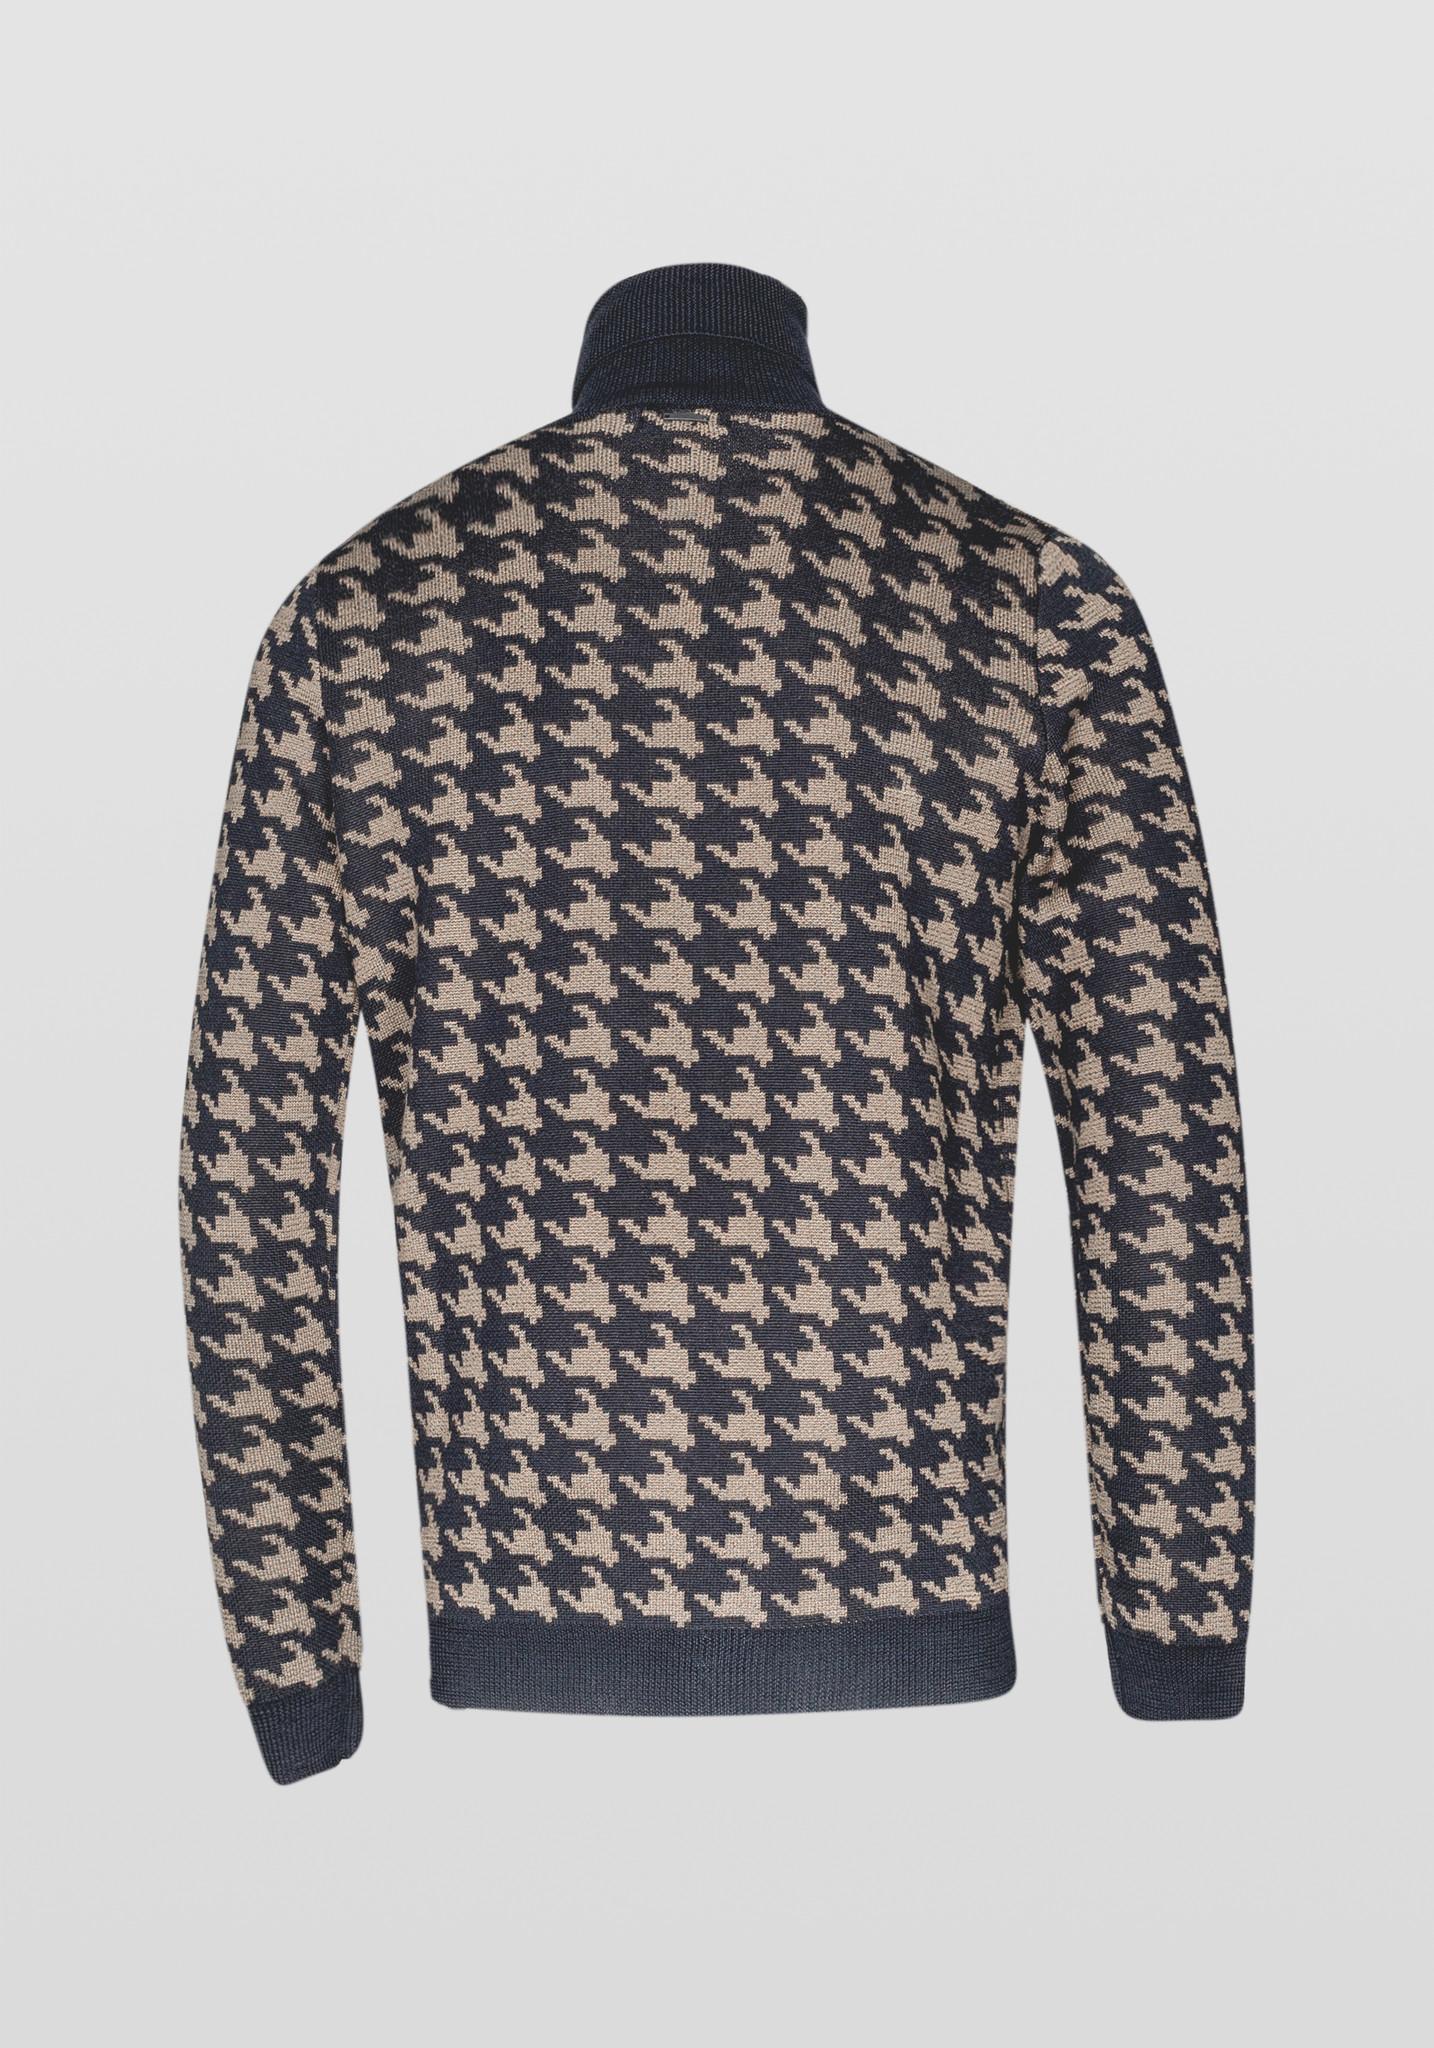 Antony Morato Pull's & cardigans Antony Morato MMSW01104-YA400006-2077